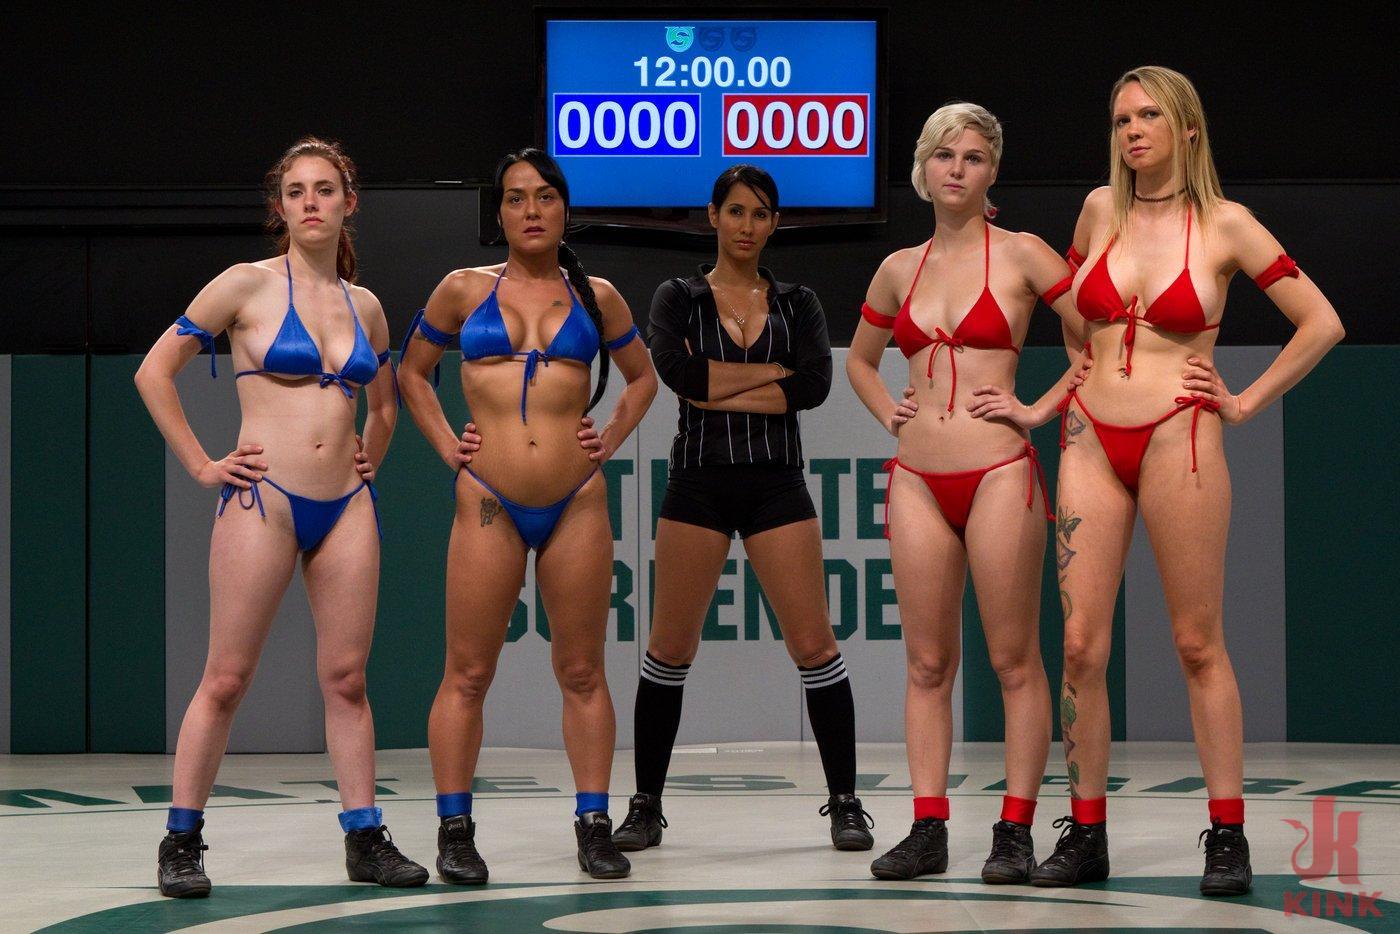 RD 1: Team Blue VS. Team Red!Brutal unscripted tag team wrestling! Sexual wrestling at it's best